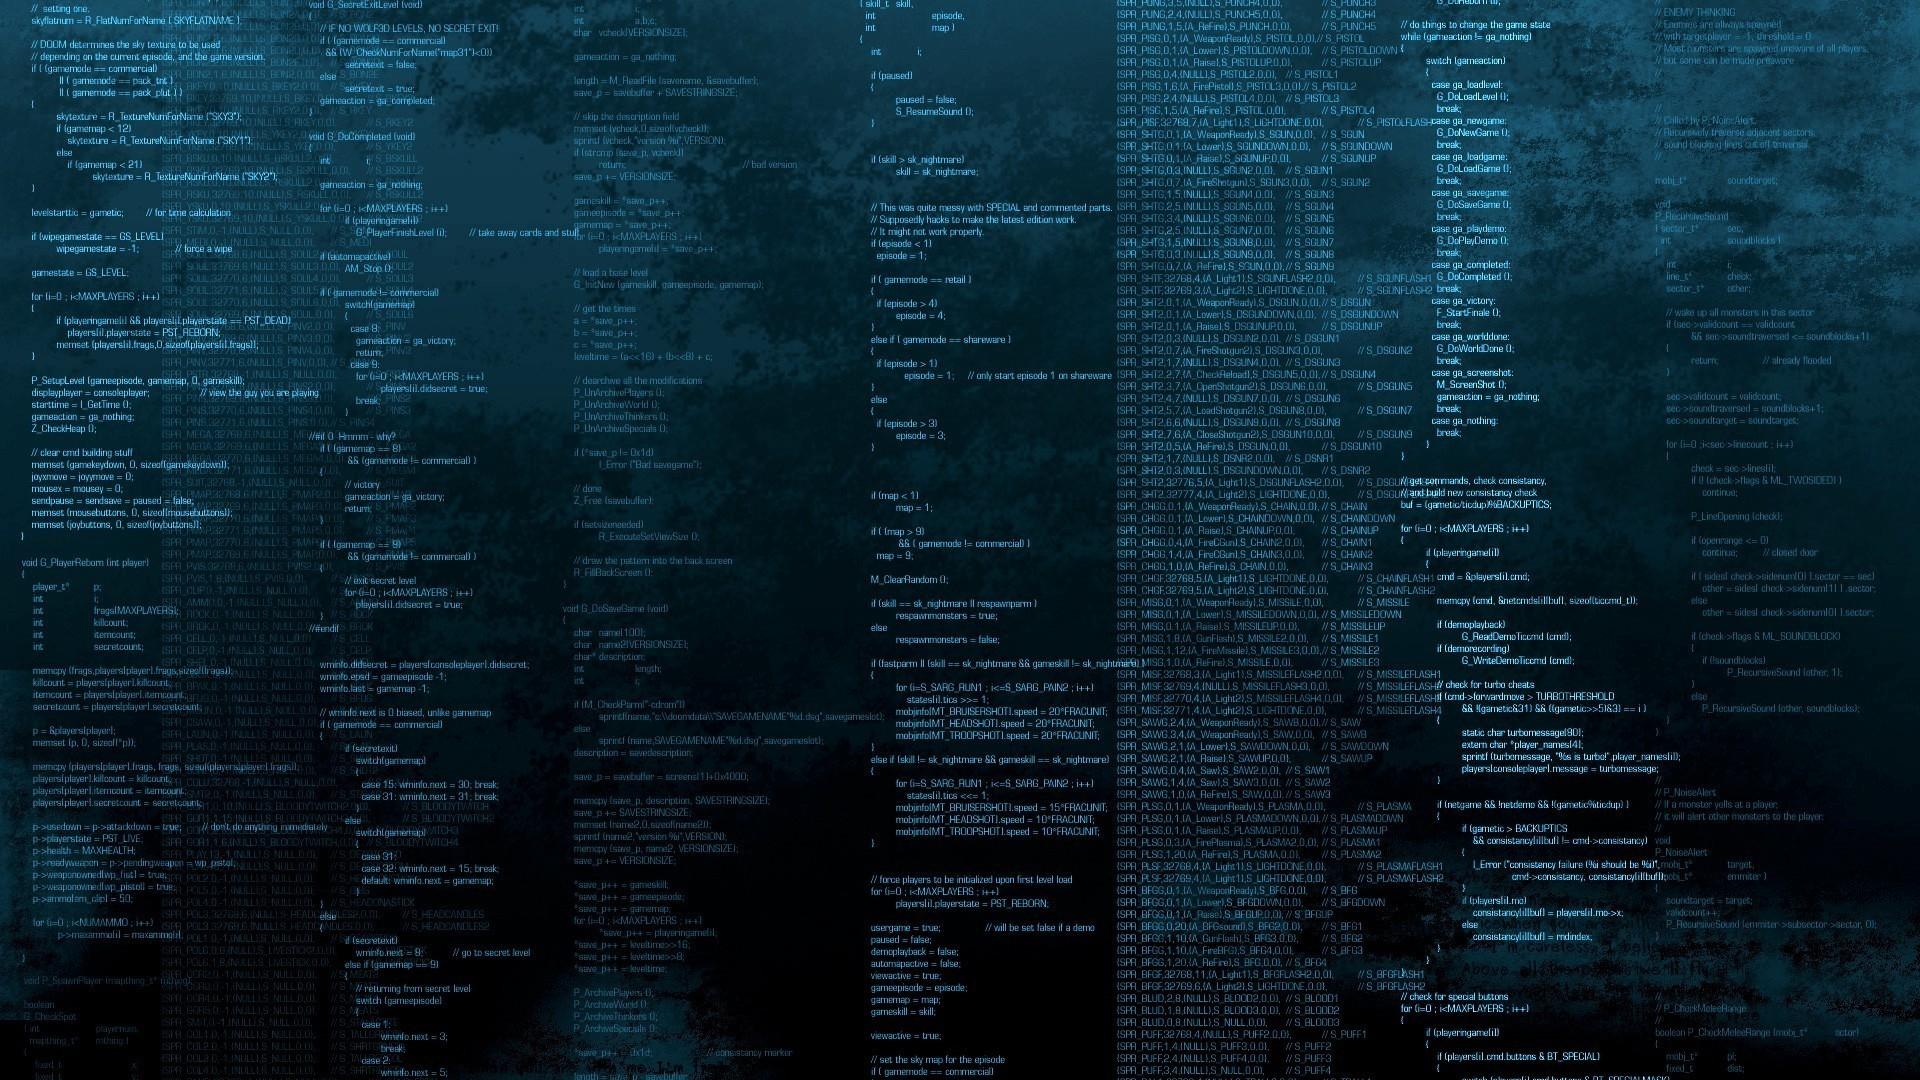 Download Wallpaper Computer Logic - text-blue-code-programming-computer-texture-knowledge-programming-language-Doom-game-logic-design-line-darkness-number-screenshot-computer-wallpaper-font-34725  Snapshot_695846 .jpg